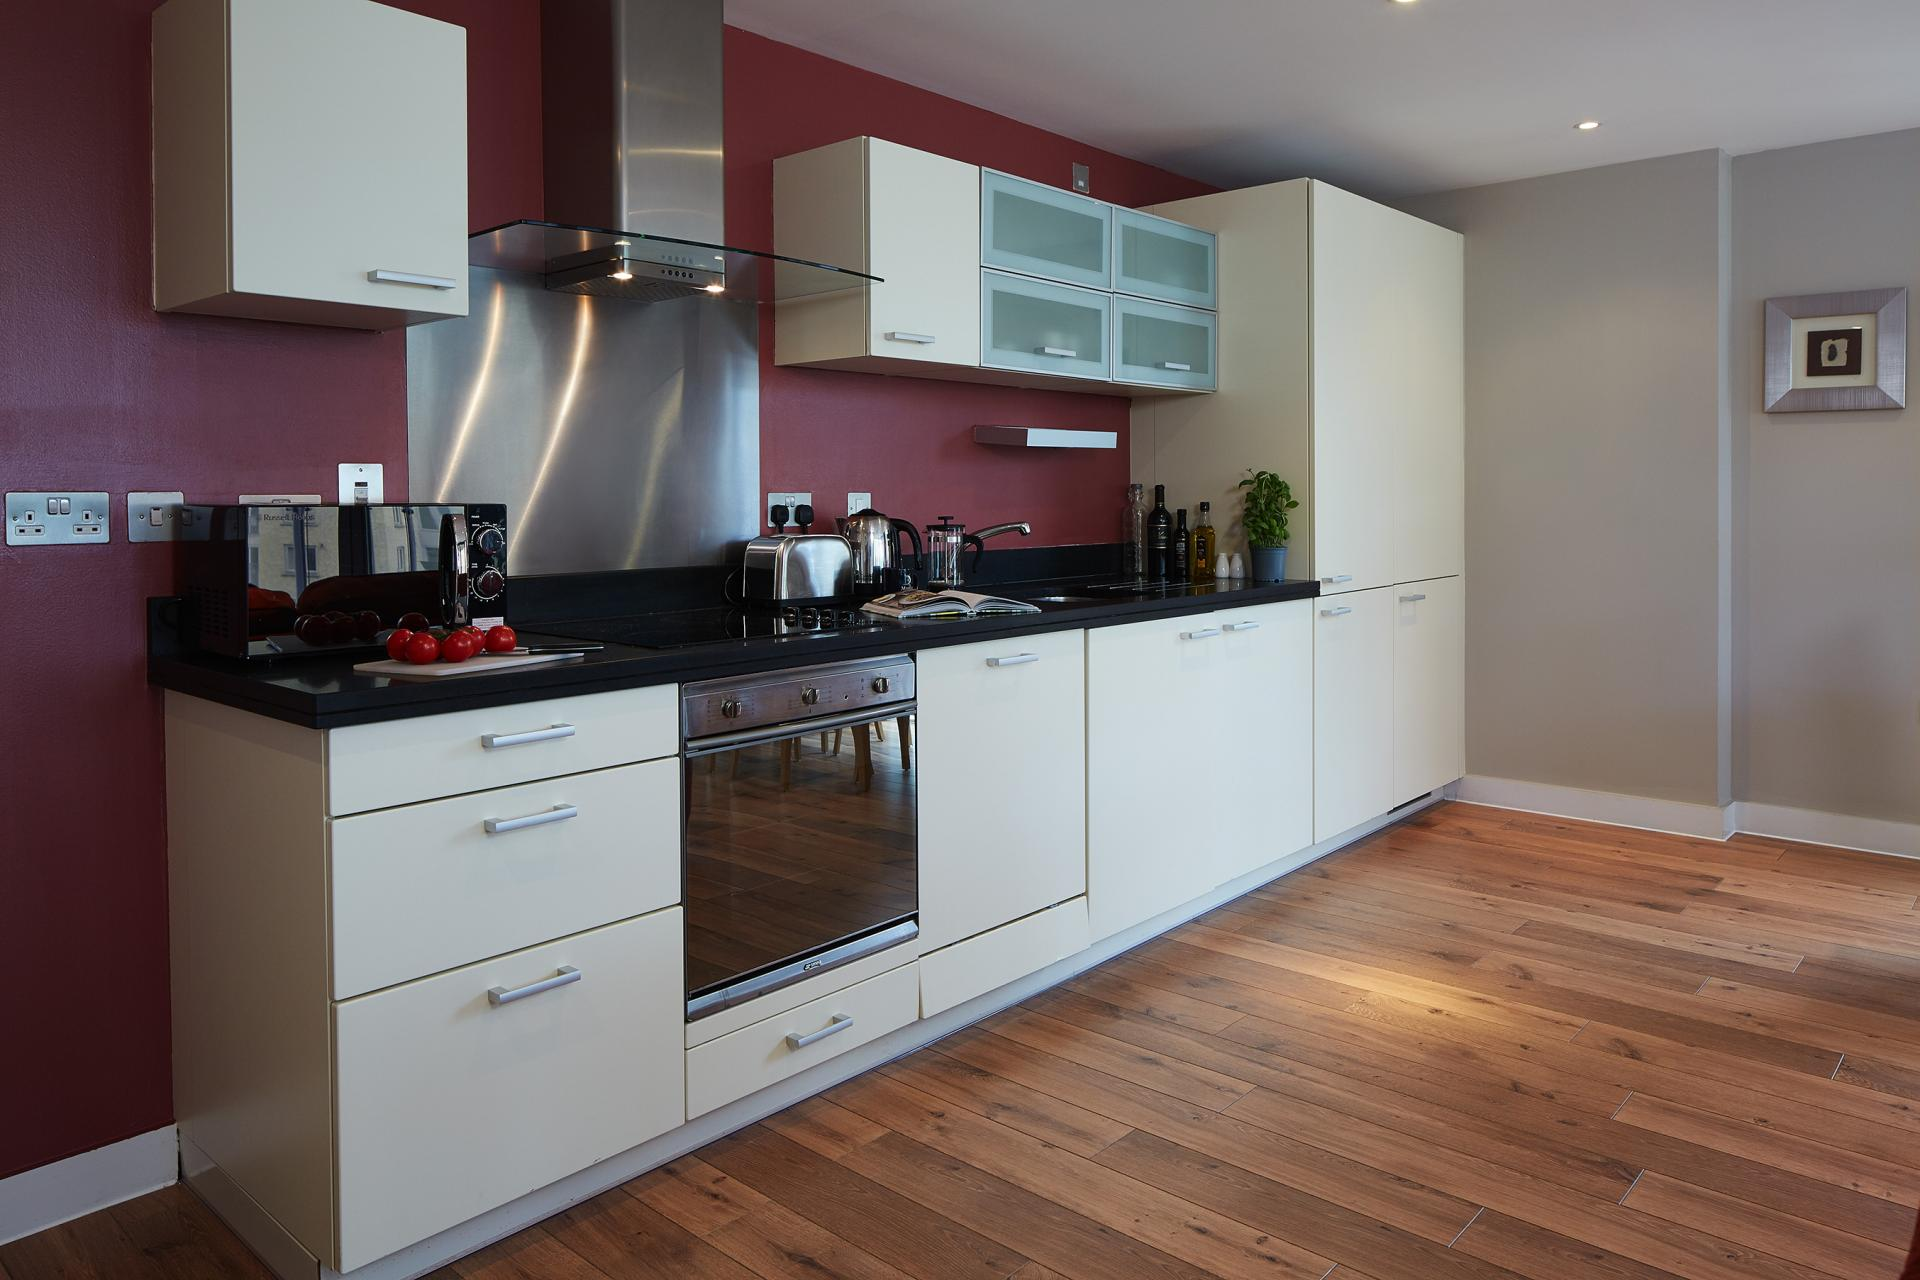 Kitchen at Marlin Canary Wharf Apartments, Canary Wharf, London